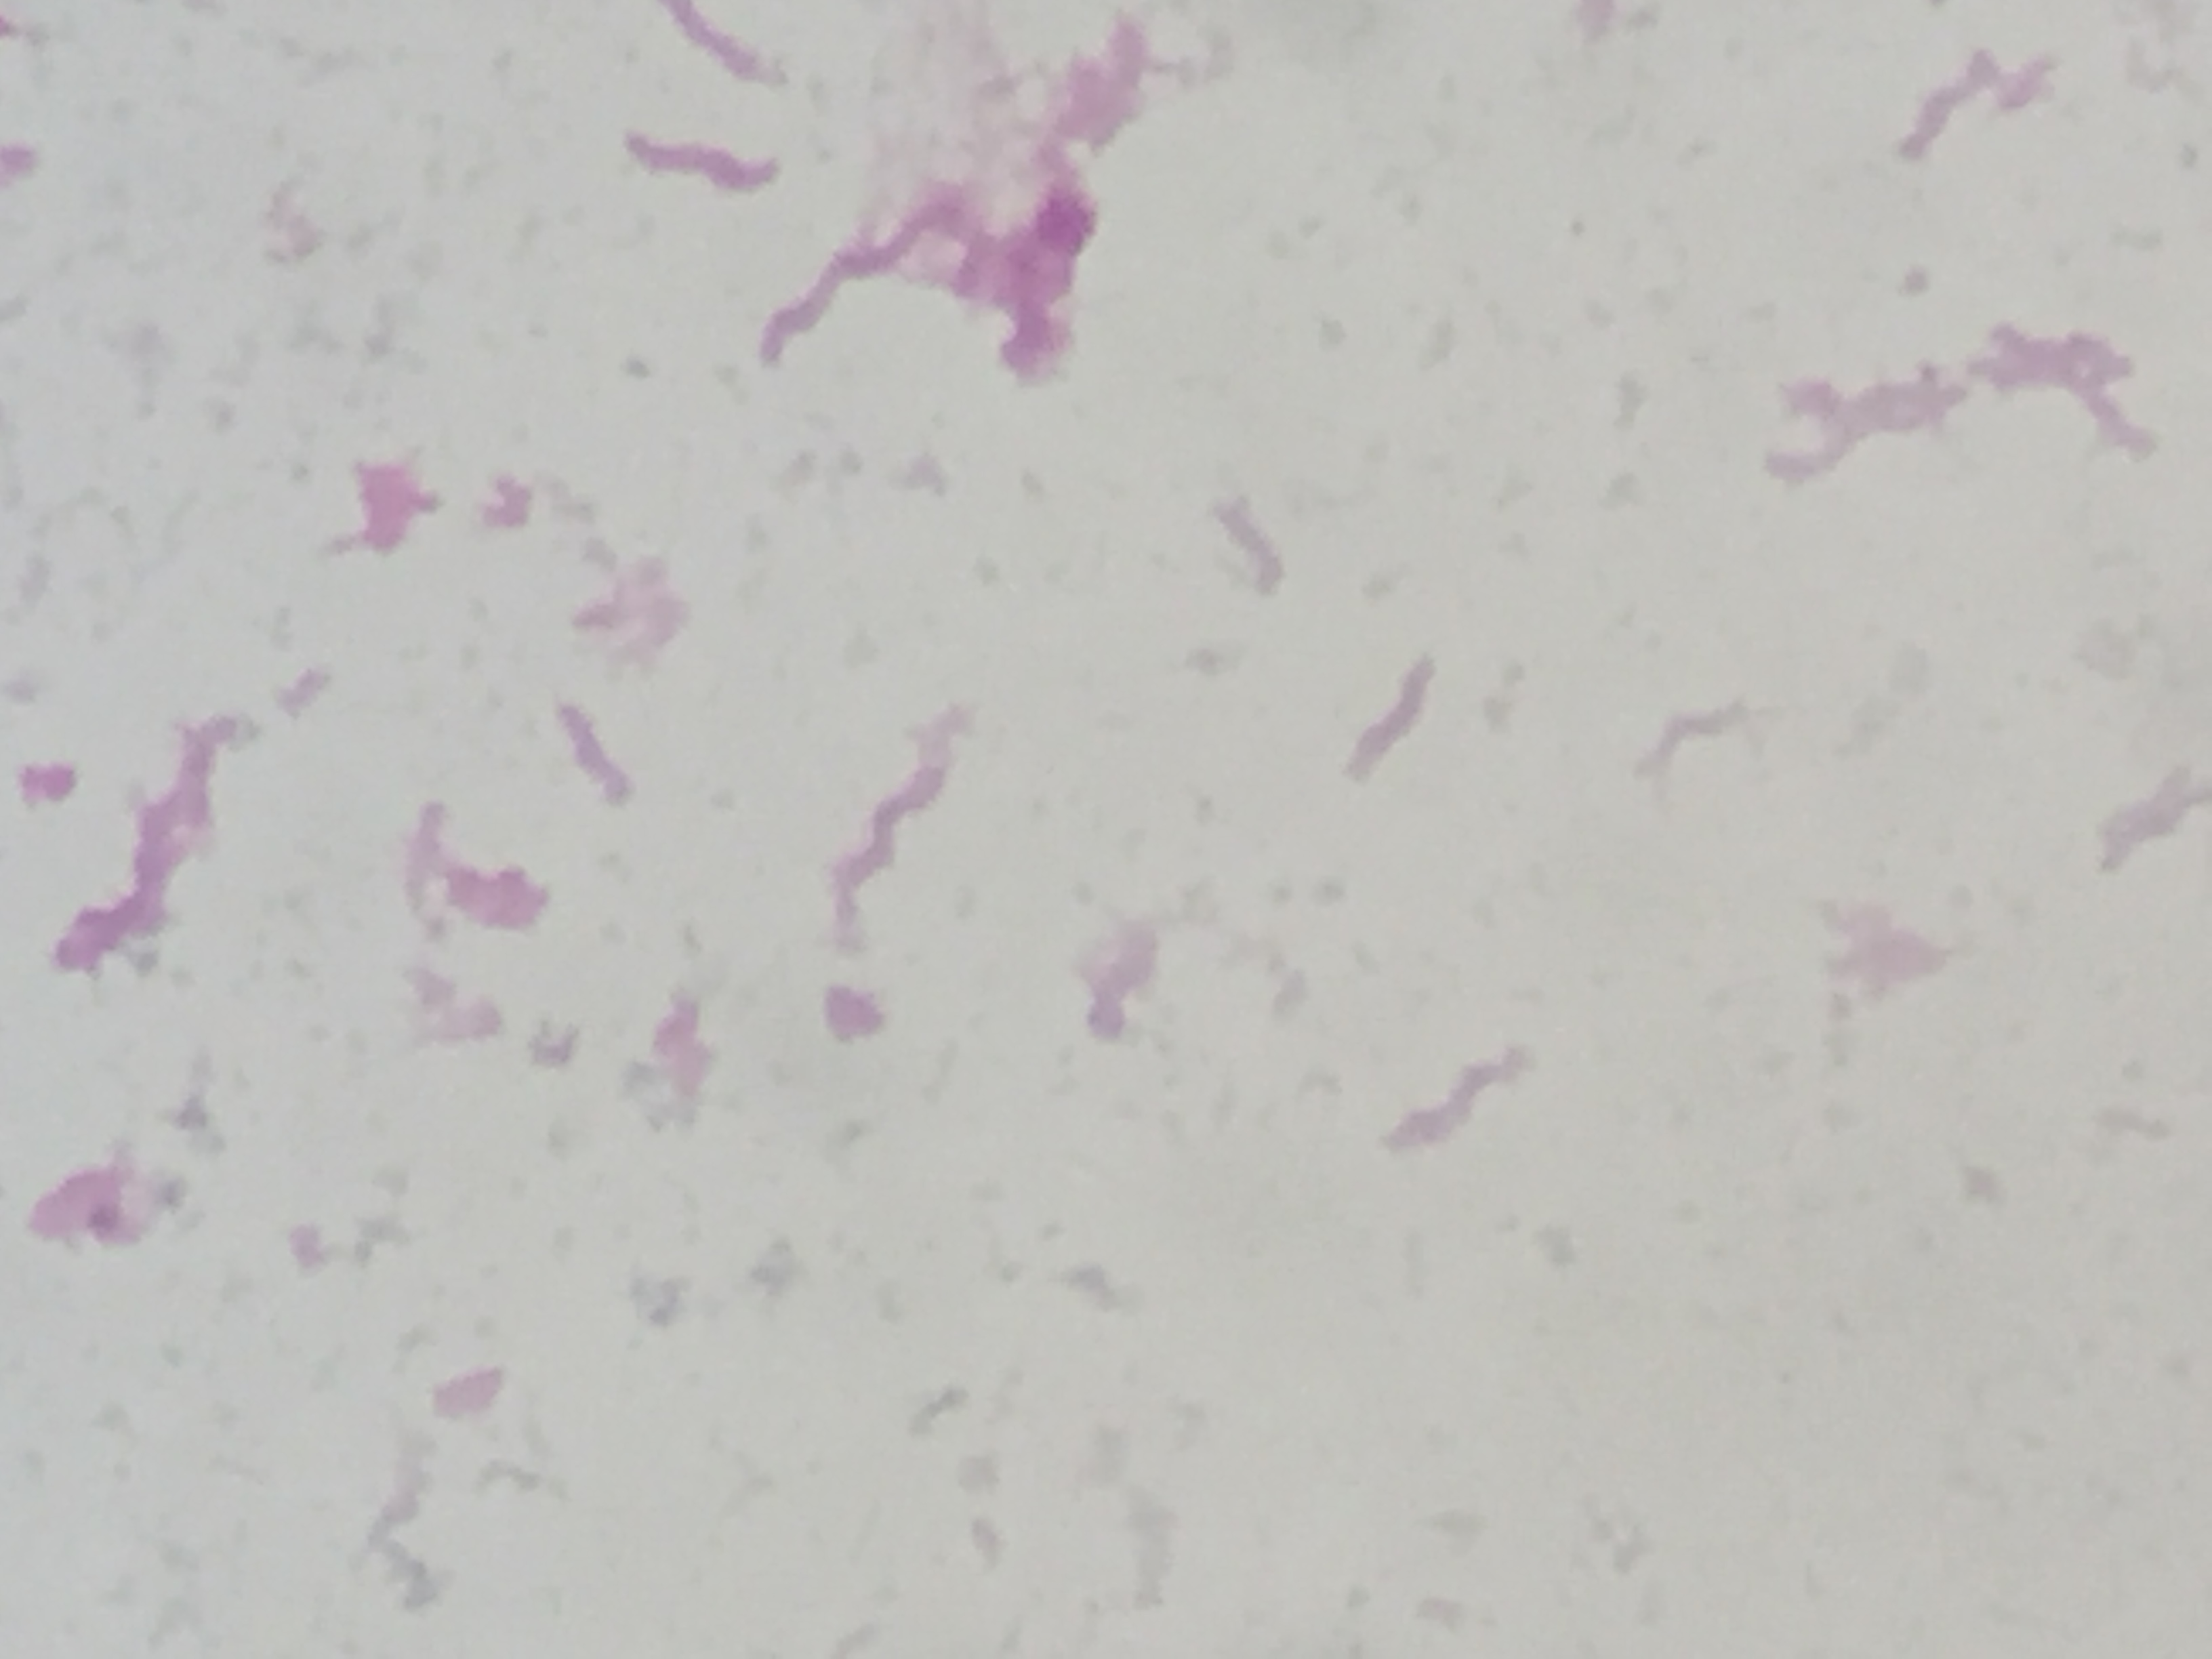 Anaerobiospirillum succiniciproducens〔嫌気性らせん桿菌〕